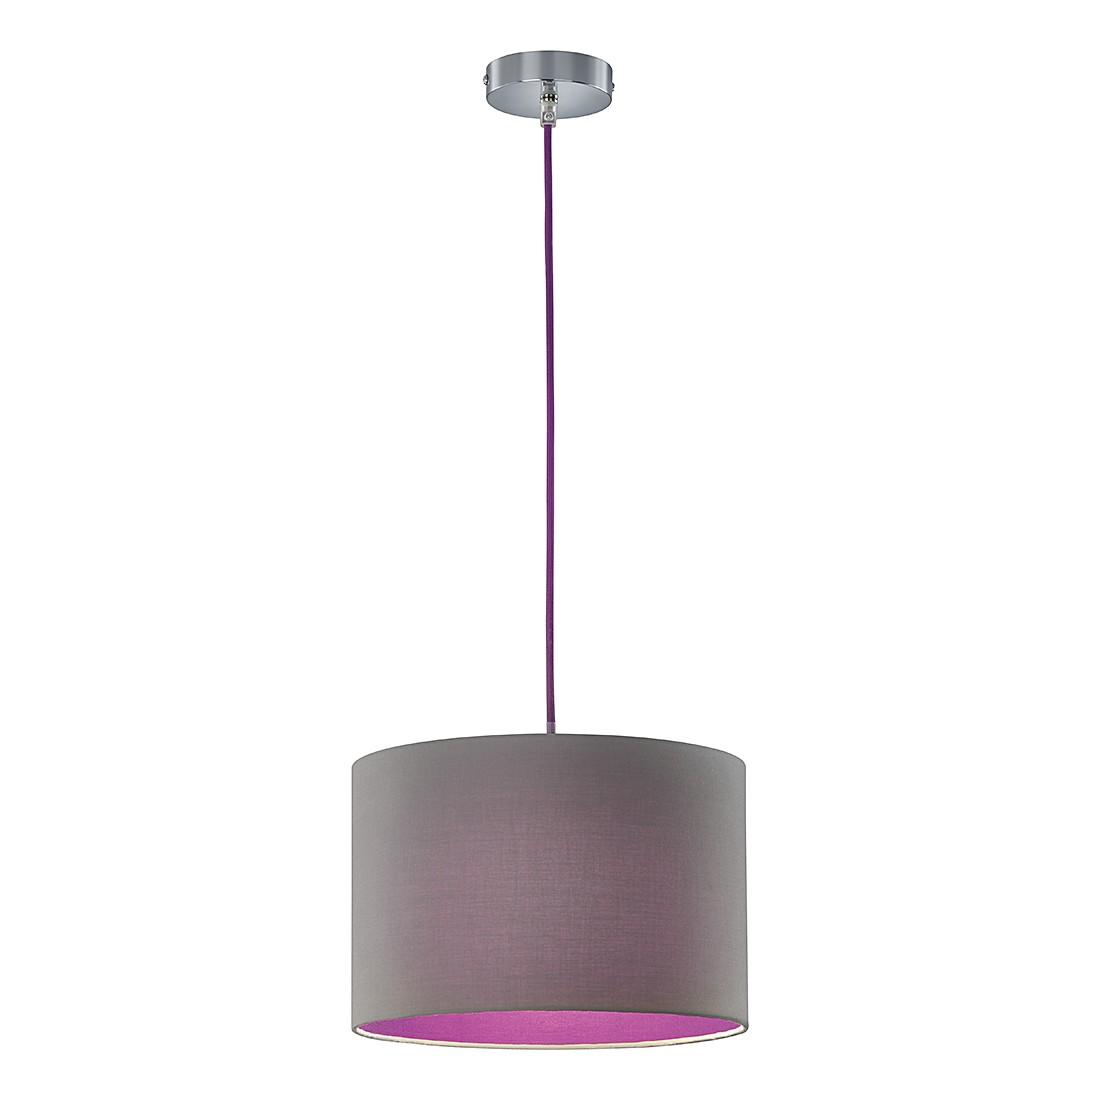 energie  A++, Hanglamp - chroomkleurig 1 lichtbron, Trio